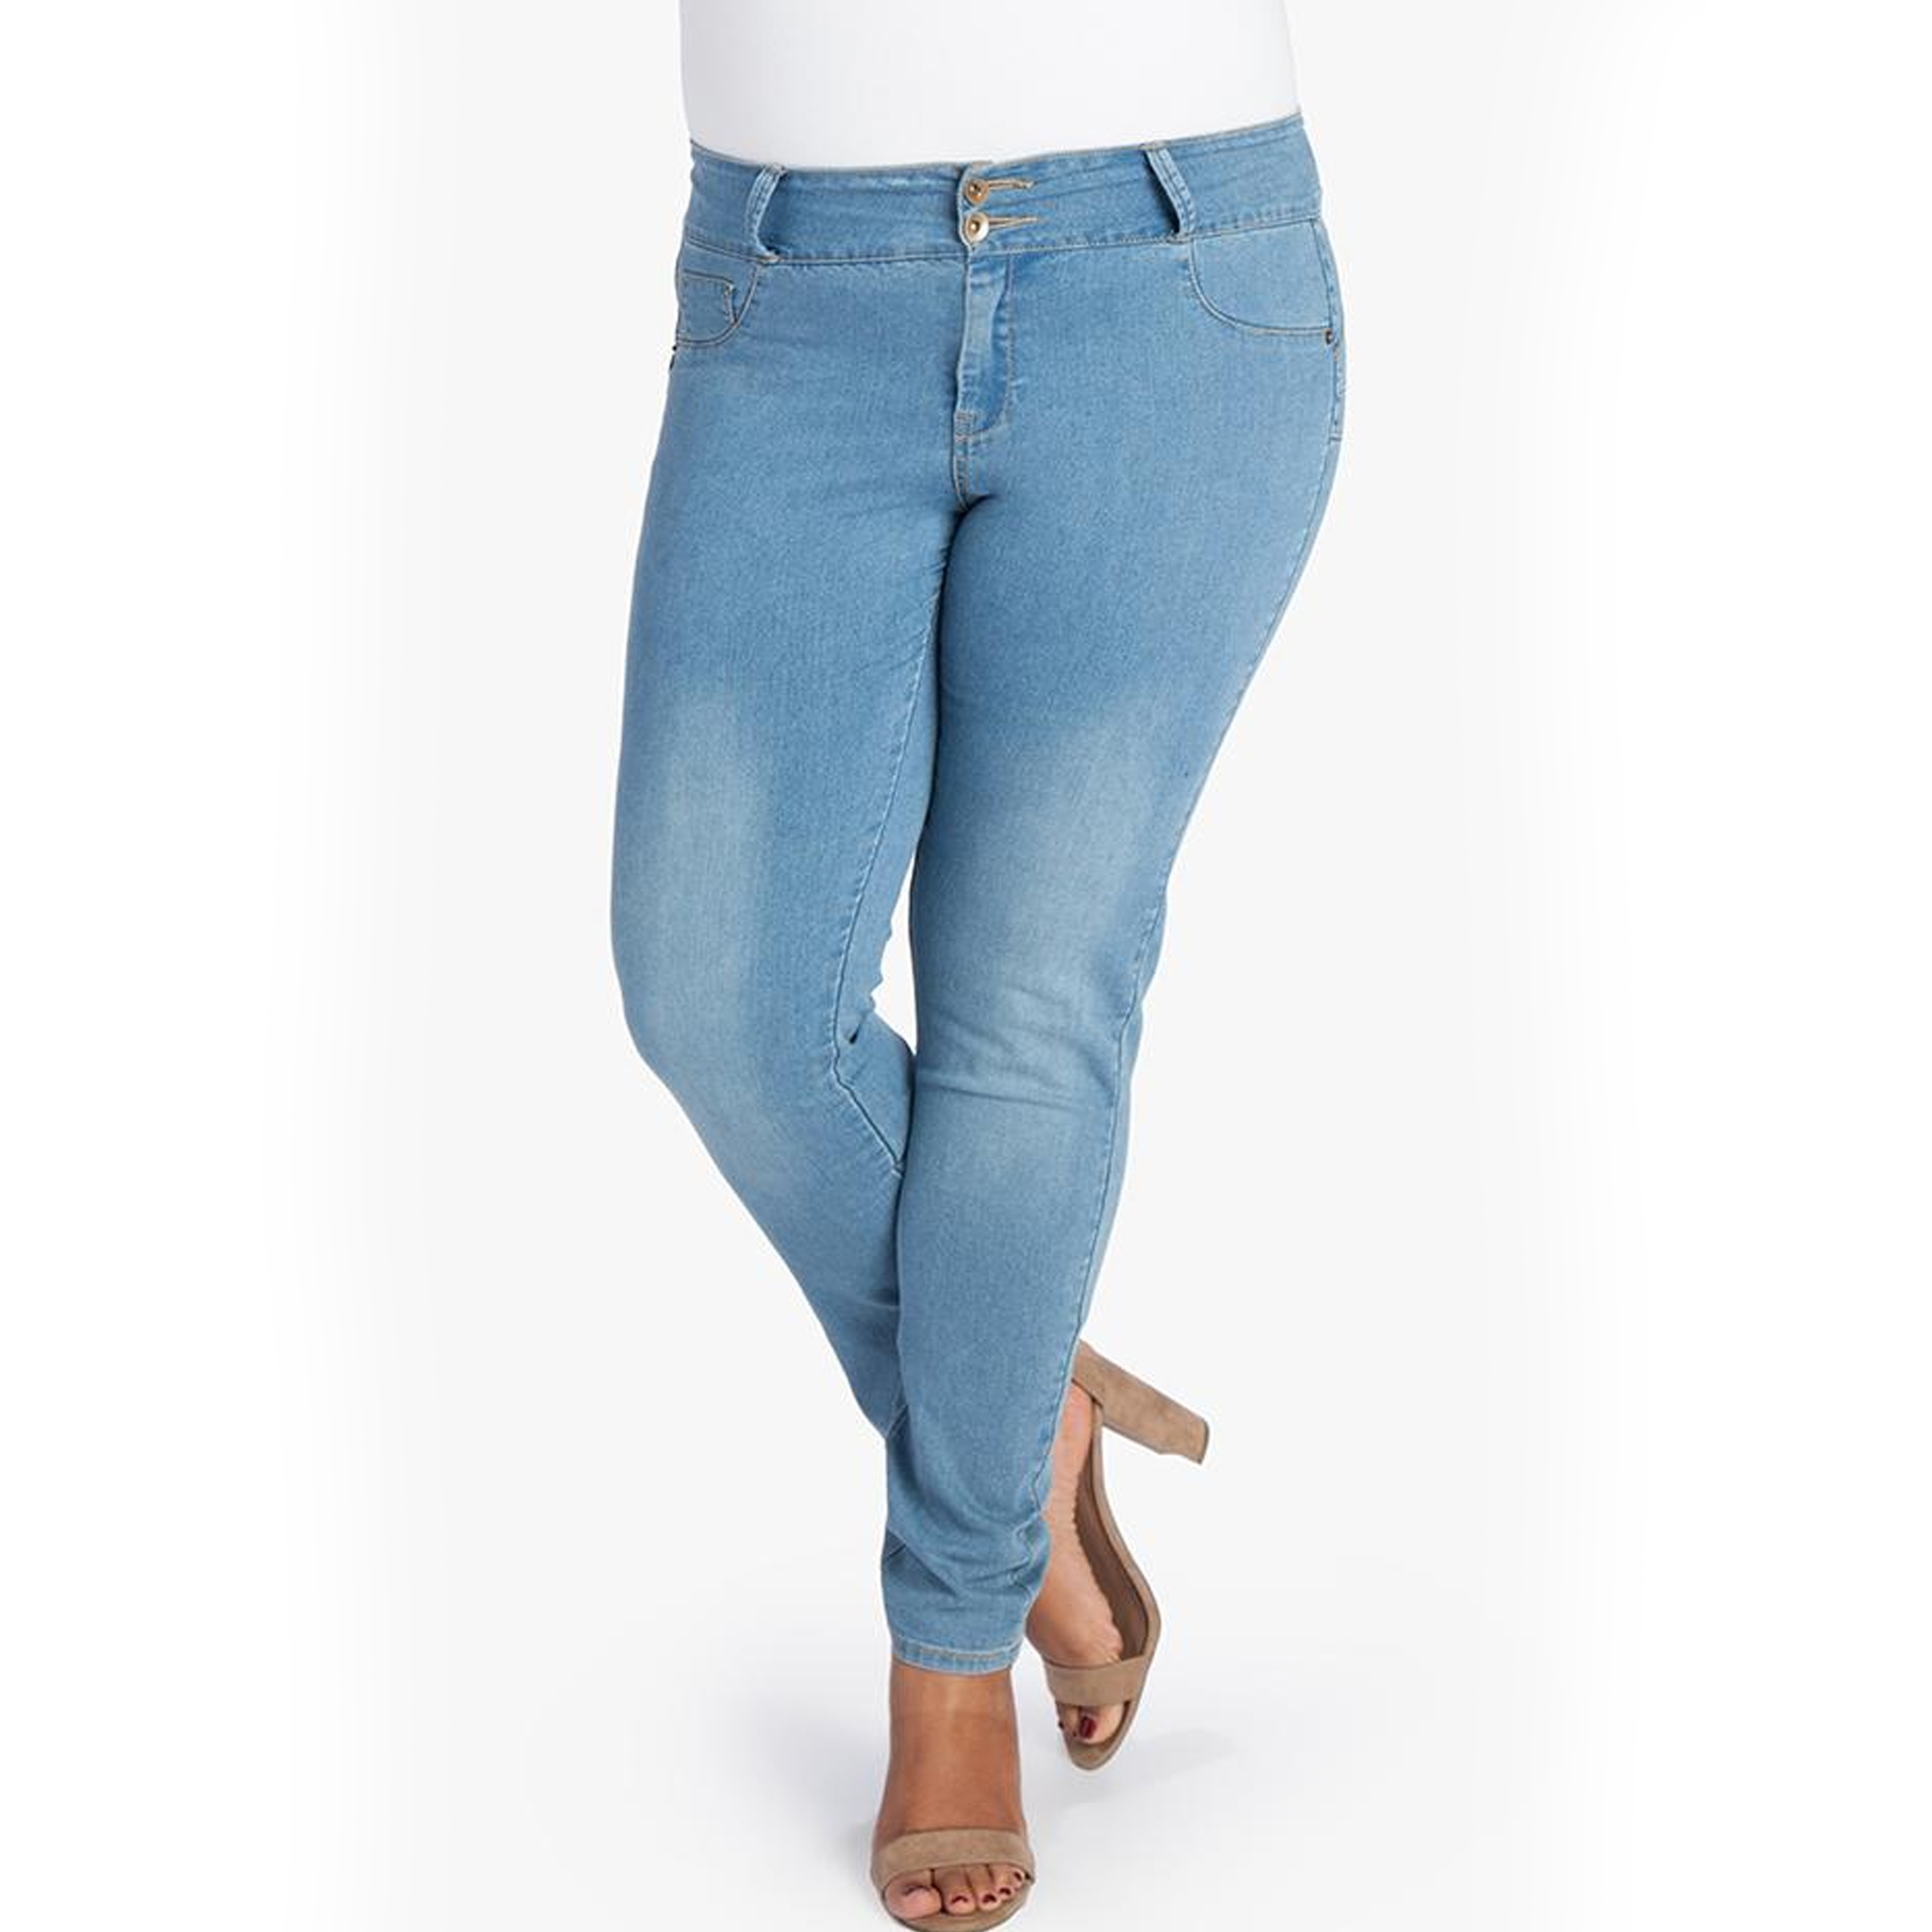 MyFit Jeans | Hellblau (44-50)